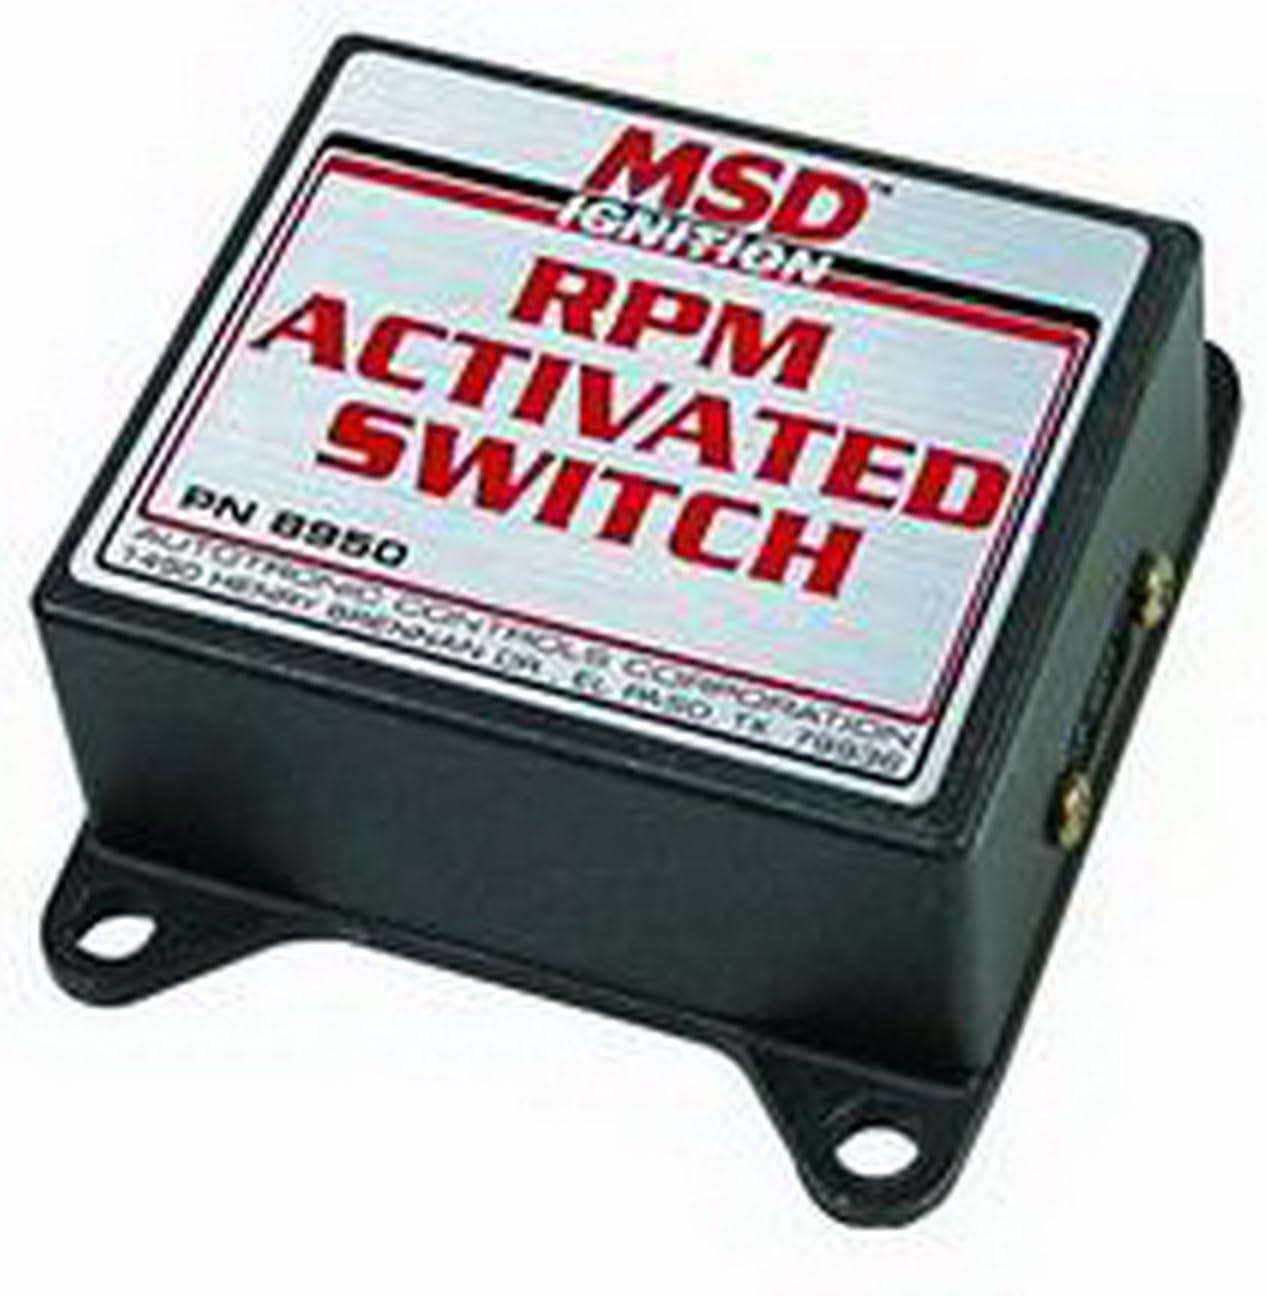 msd rpm switch wiring diagram amazon com msd 8950 rpm activated switch automotive  msd 8950 rpm activated switch